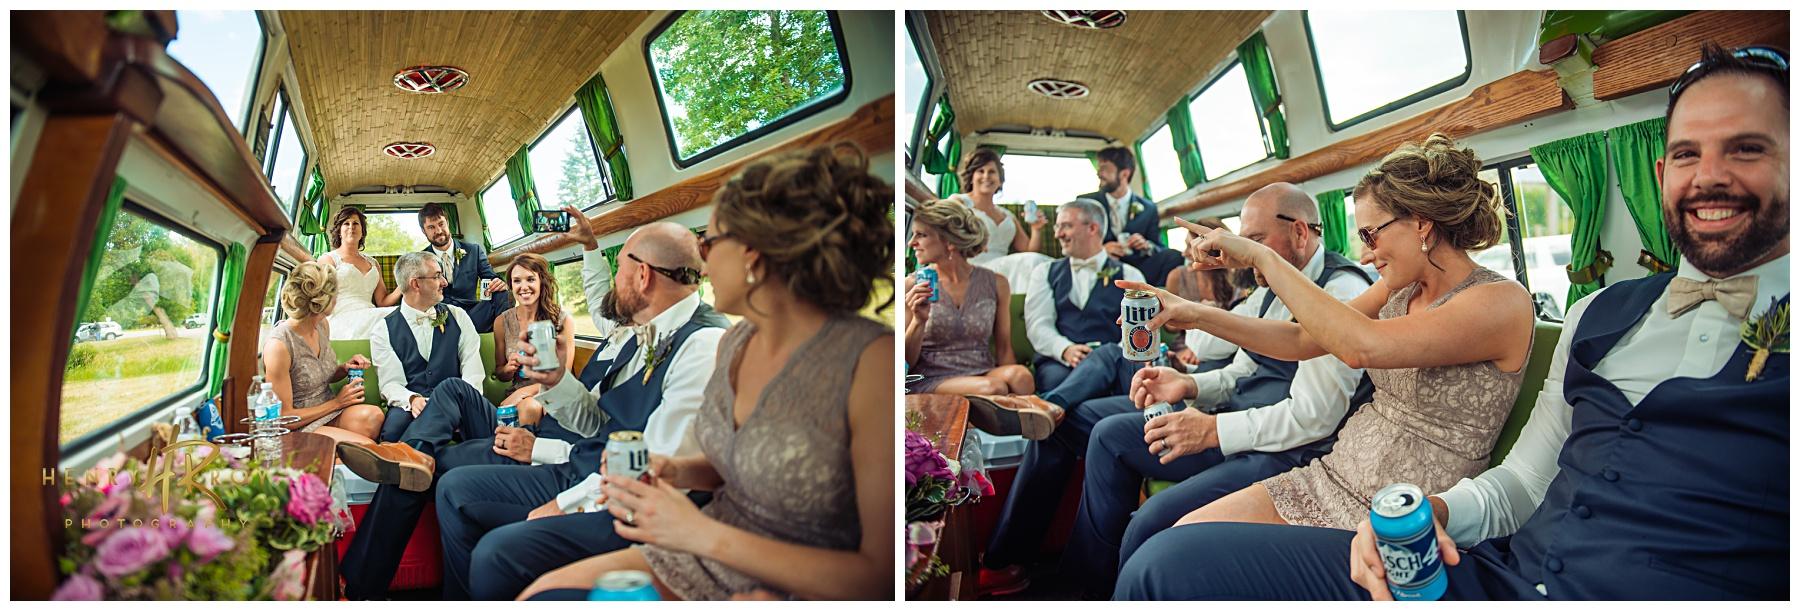 Rapid City Wedding Photographer045.jpg